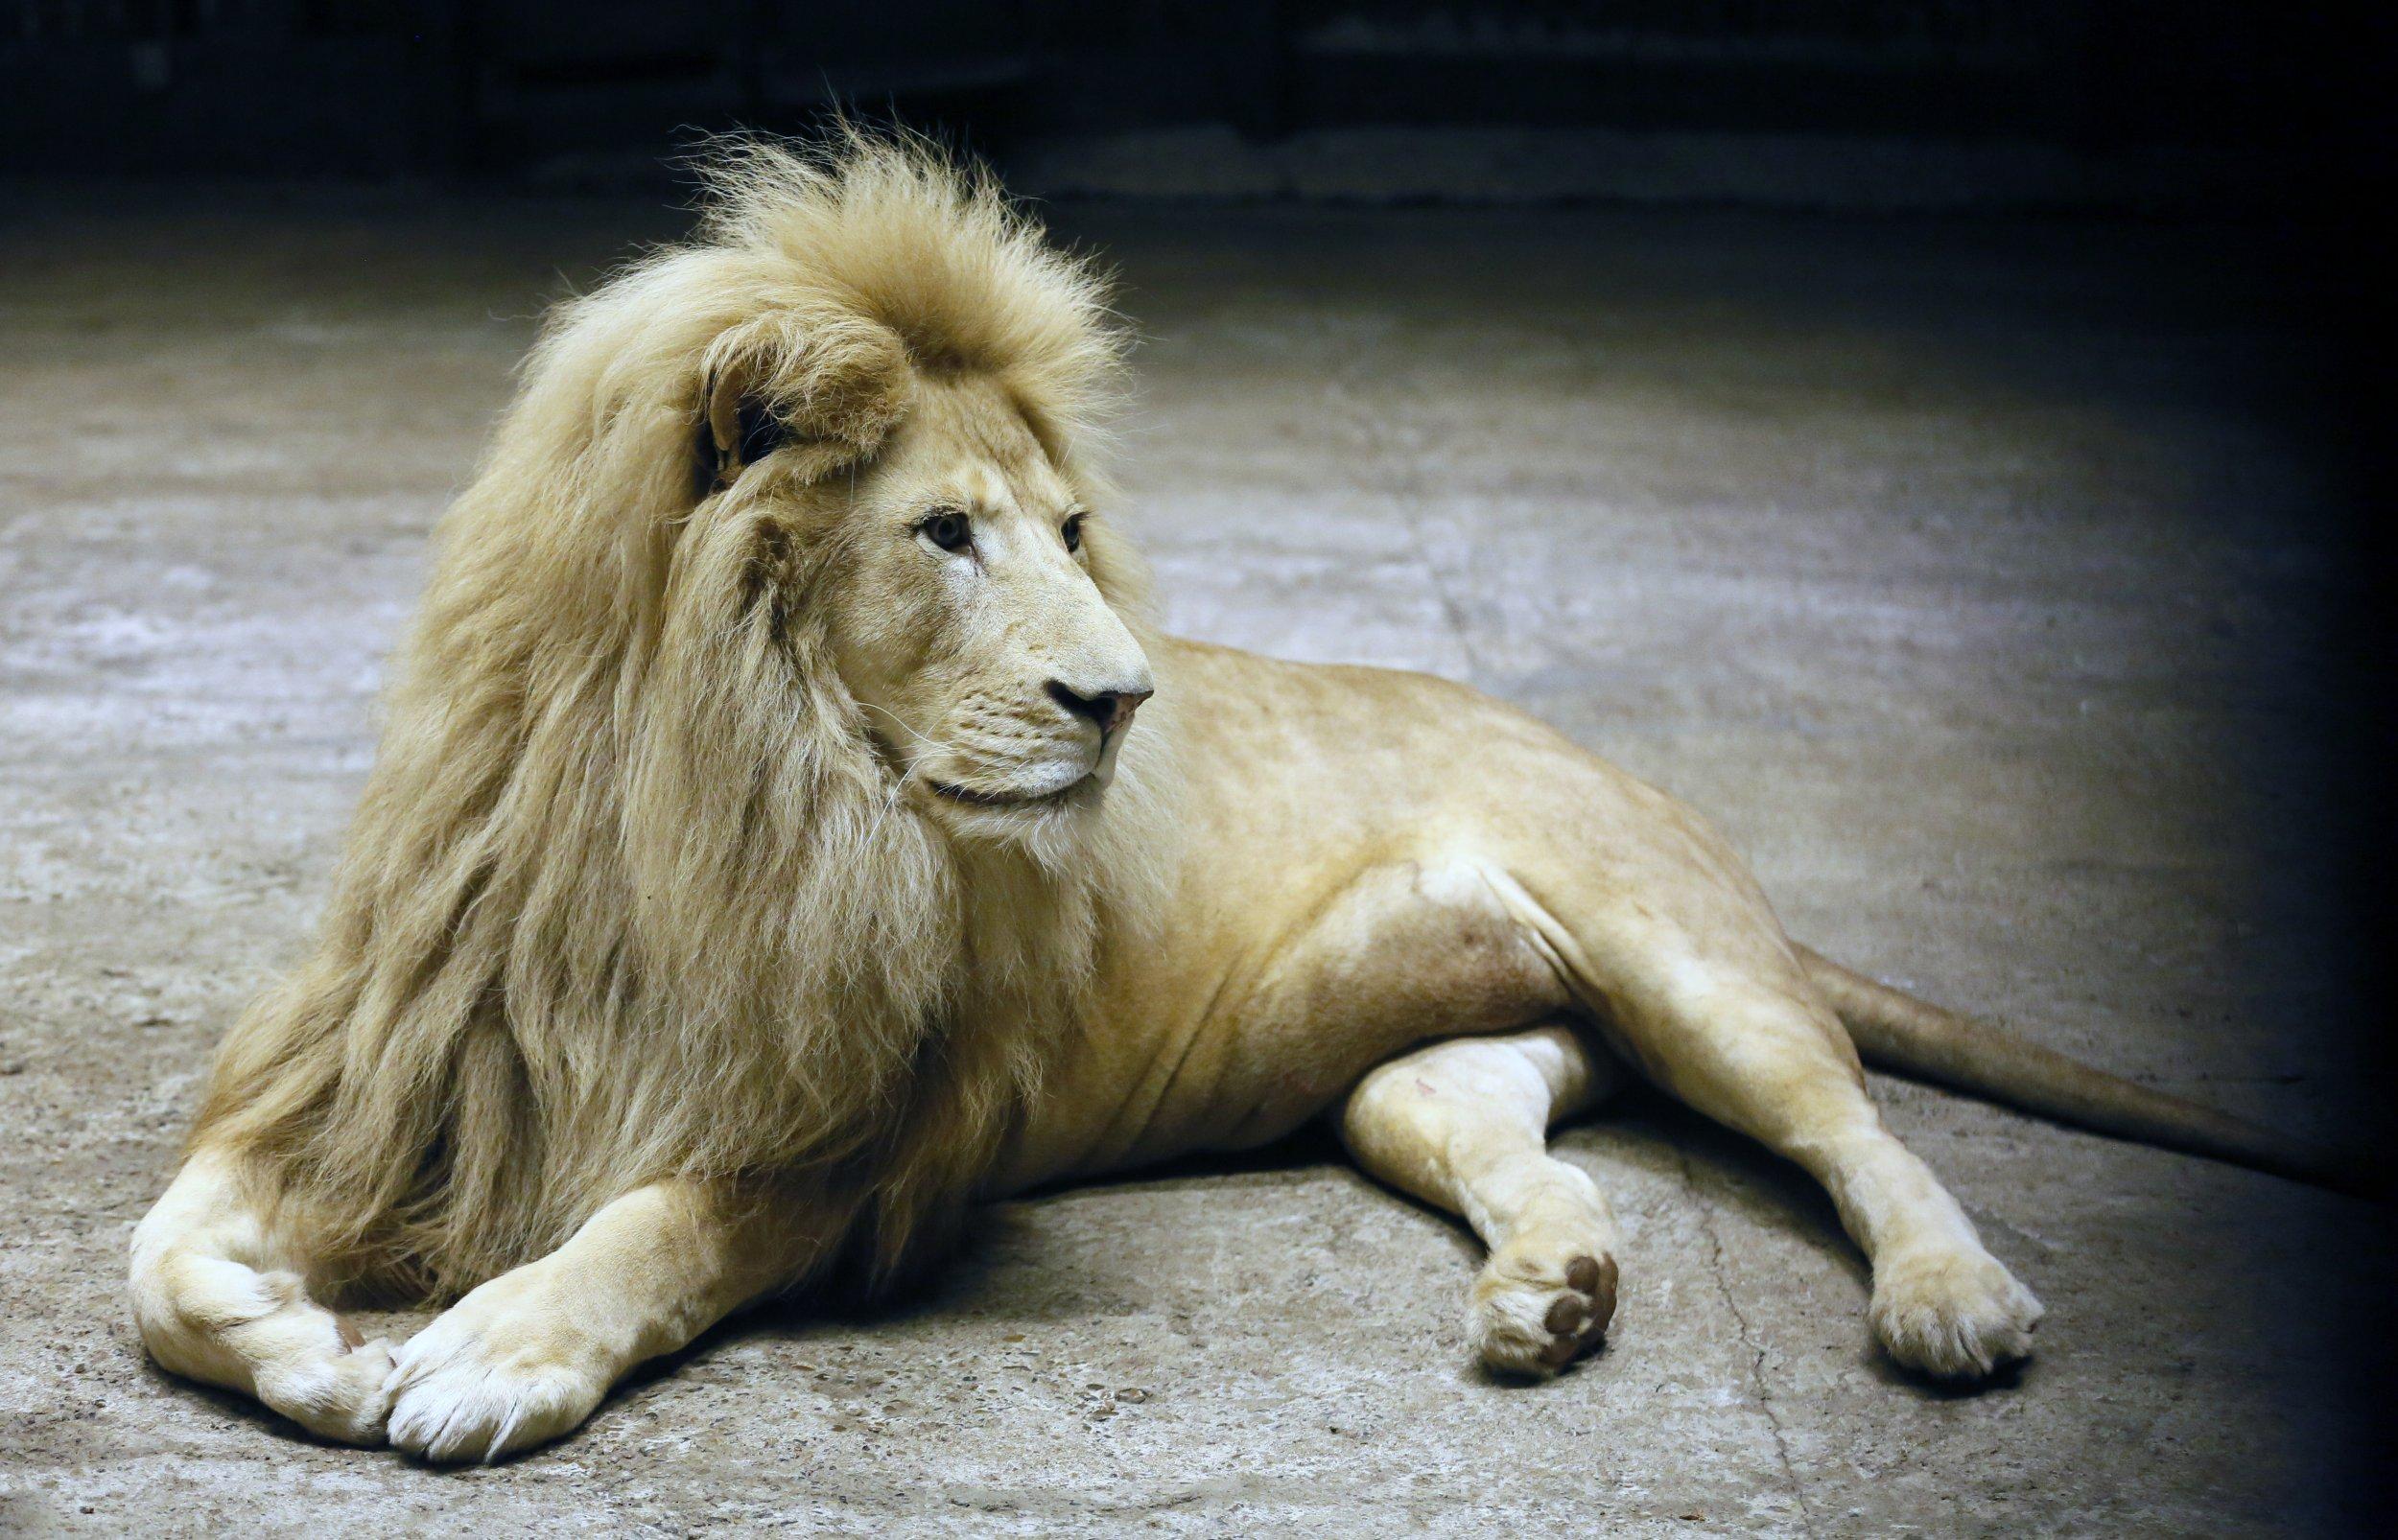 lions - photo #20